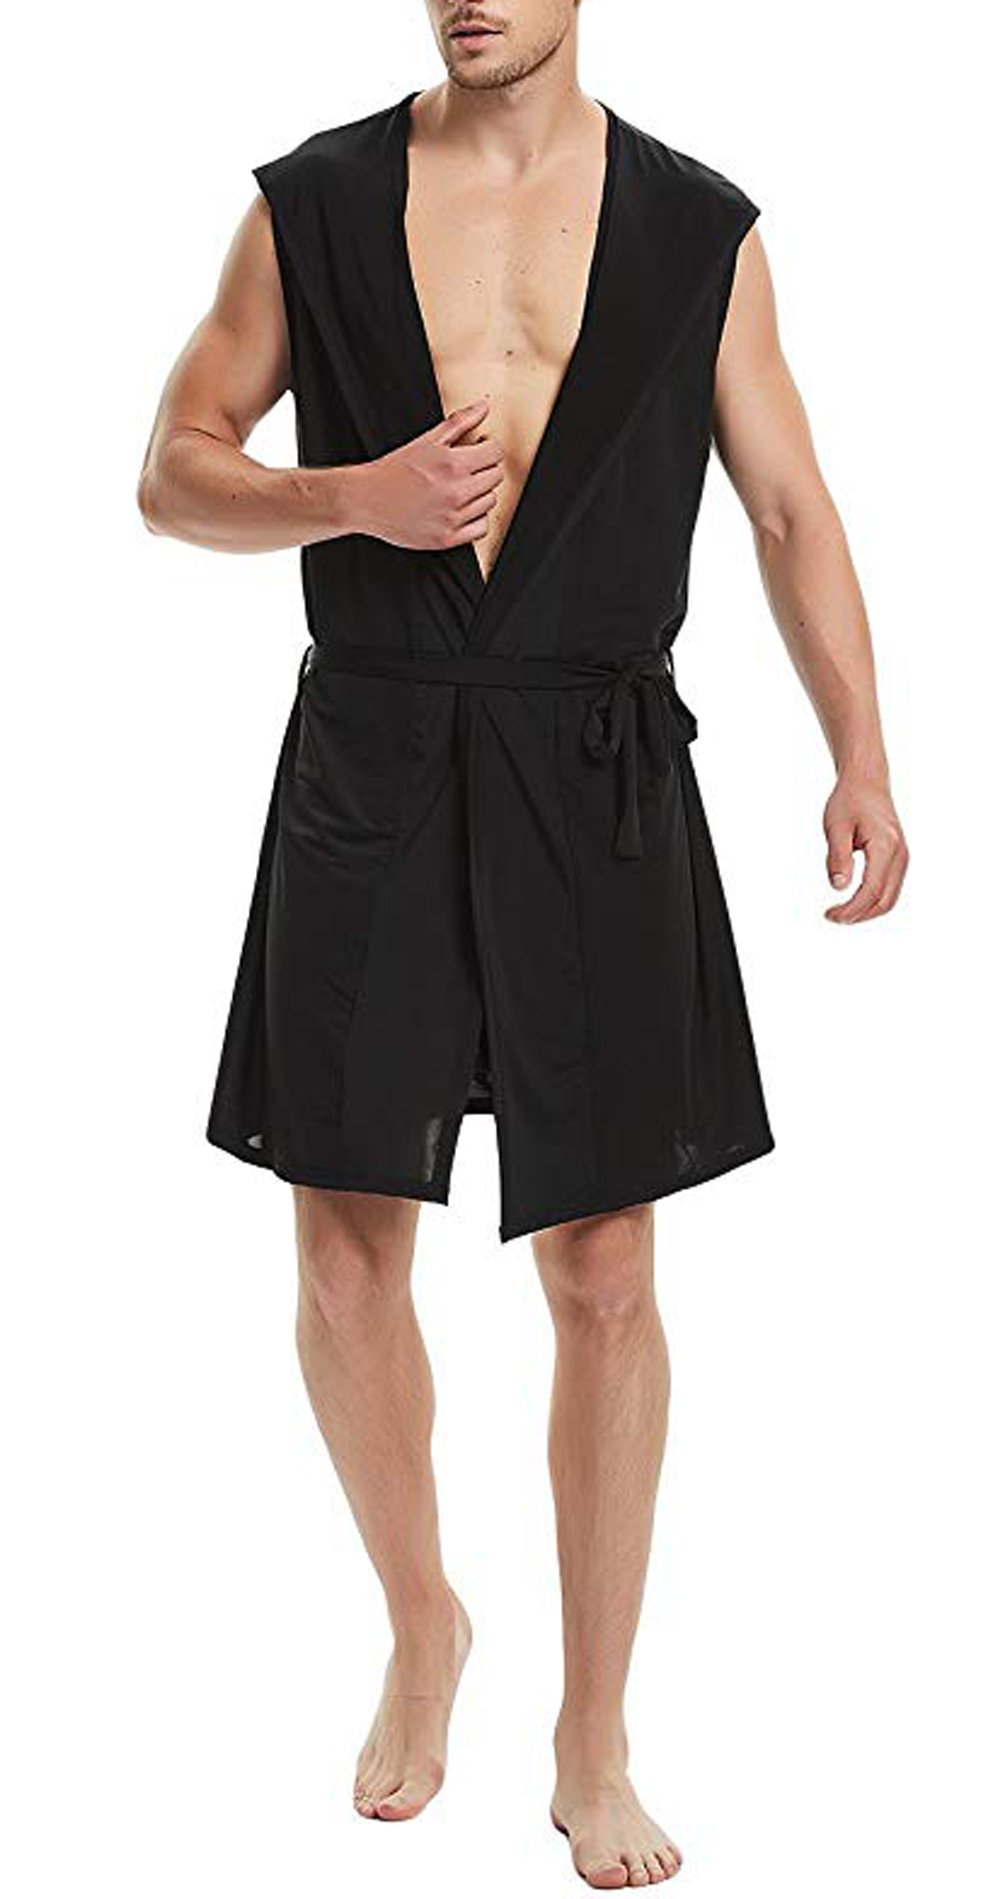 AIEOE Mens Milk Silk Robe Summer Fitness Room Bathrobe Sports Western Surfing Cover up 3XL Black